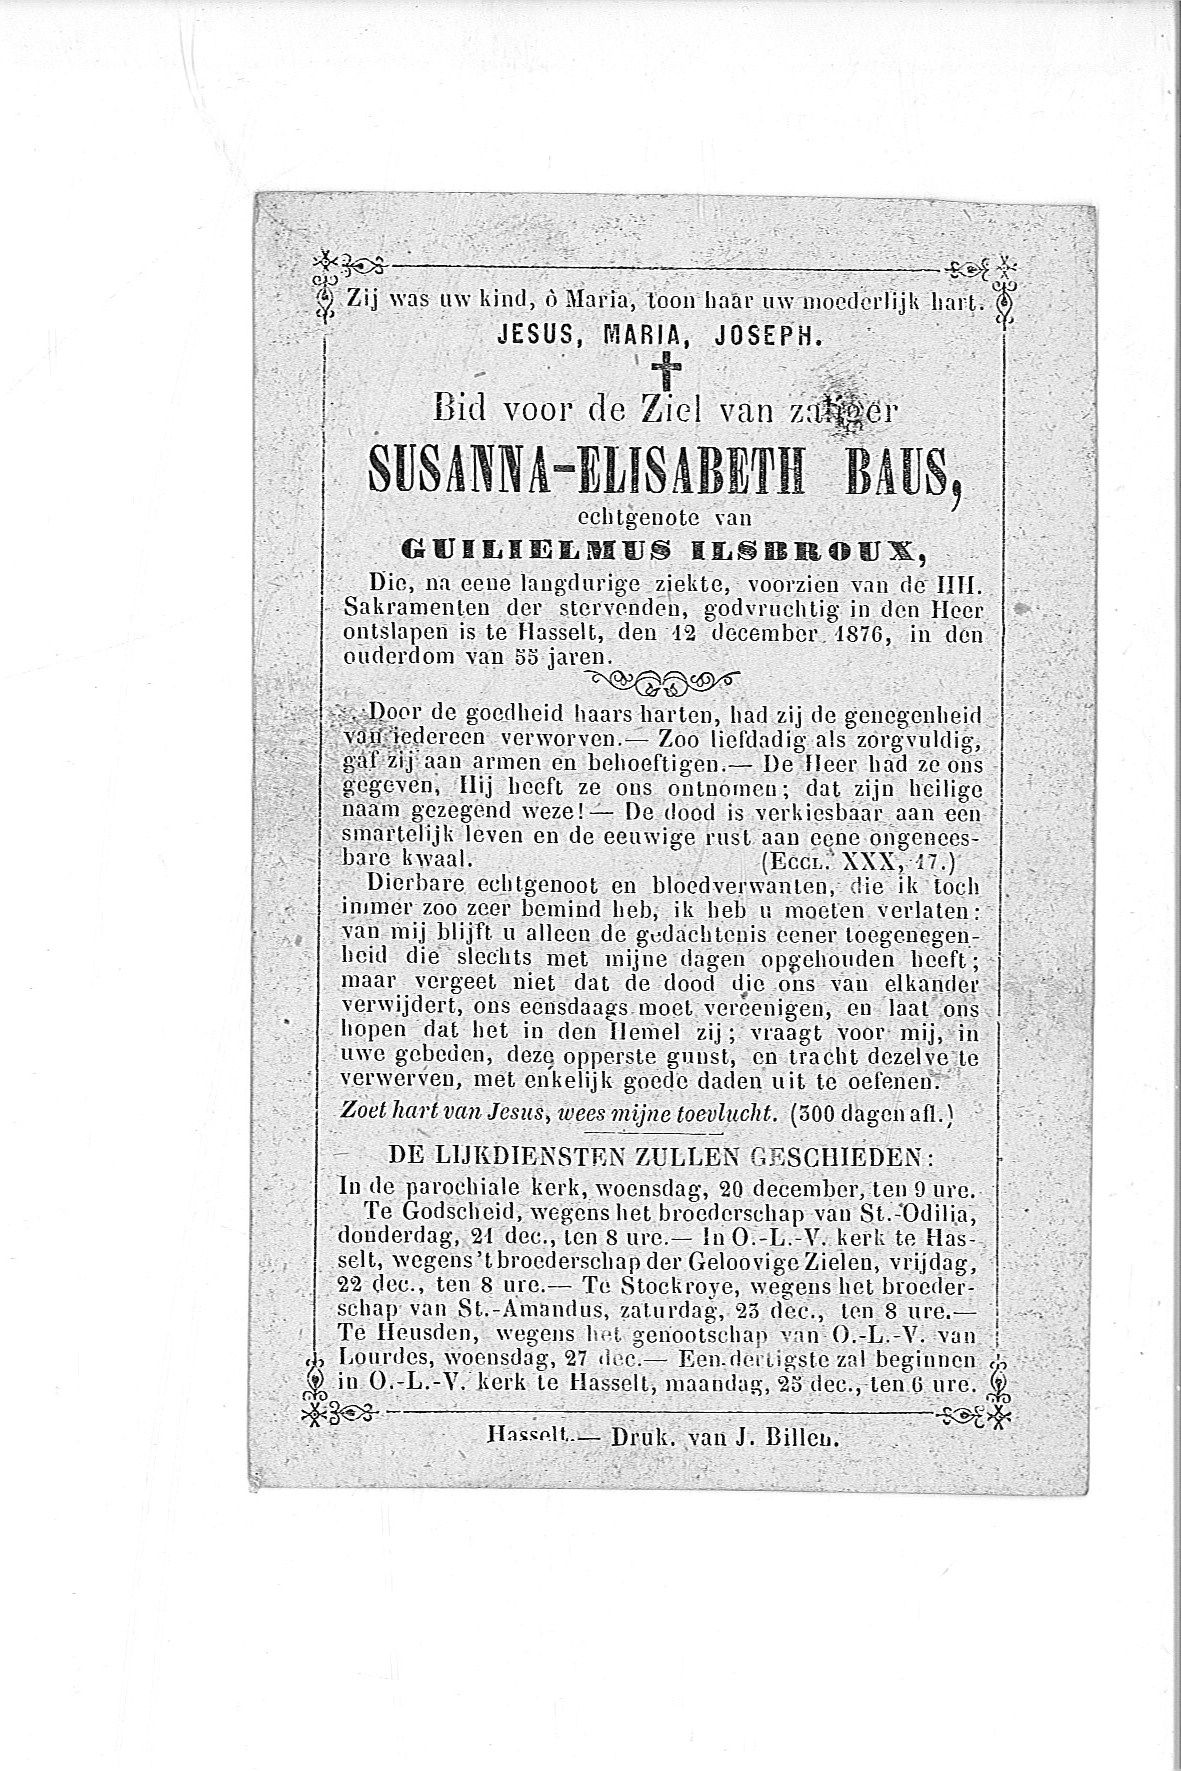 susanna-elisabeth(1877)20090709113558_00036.jpg